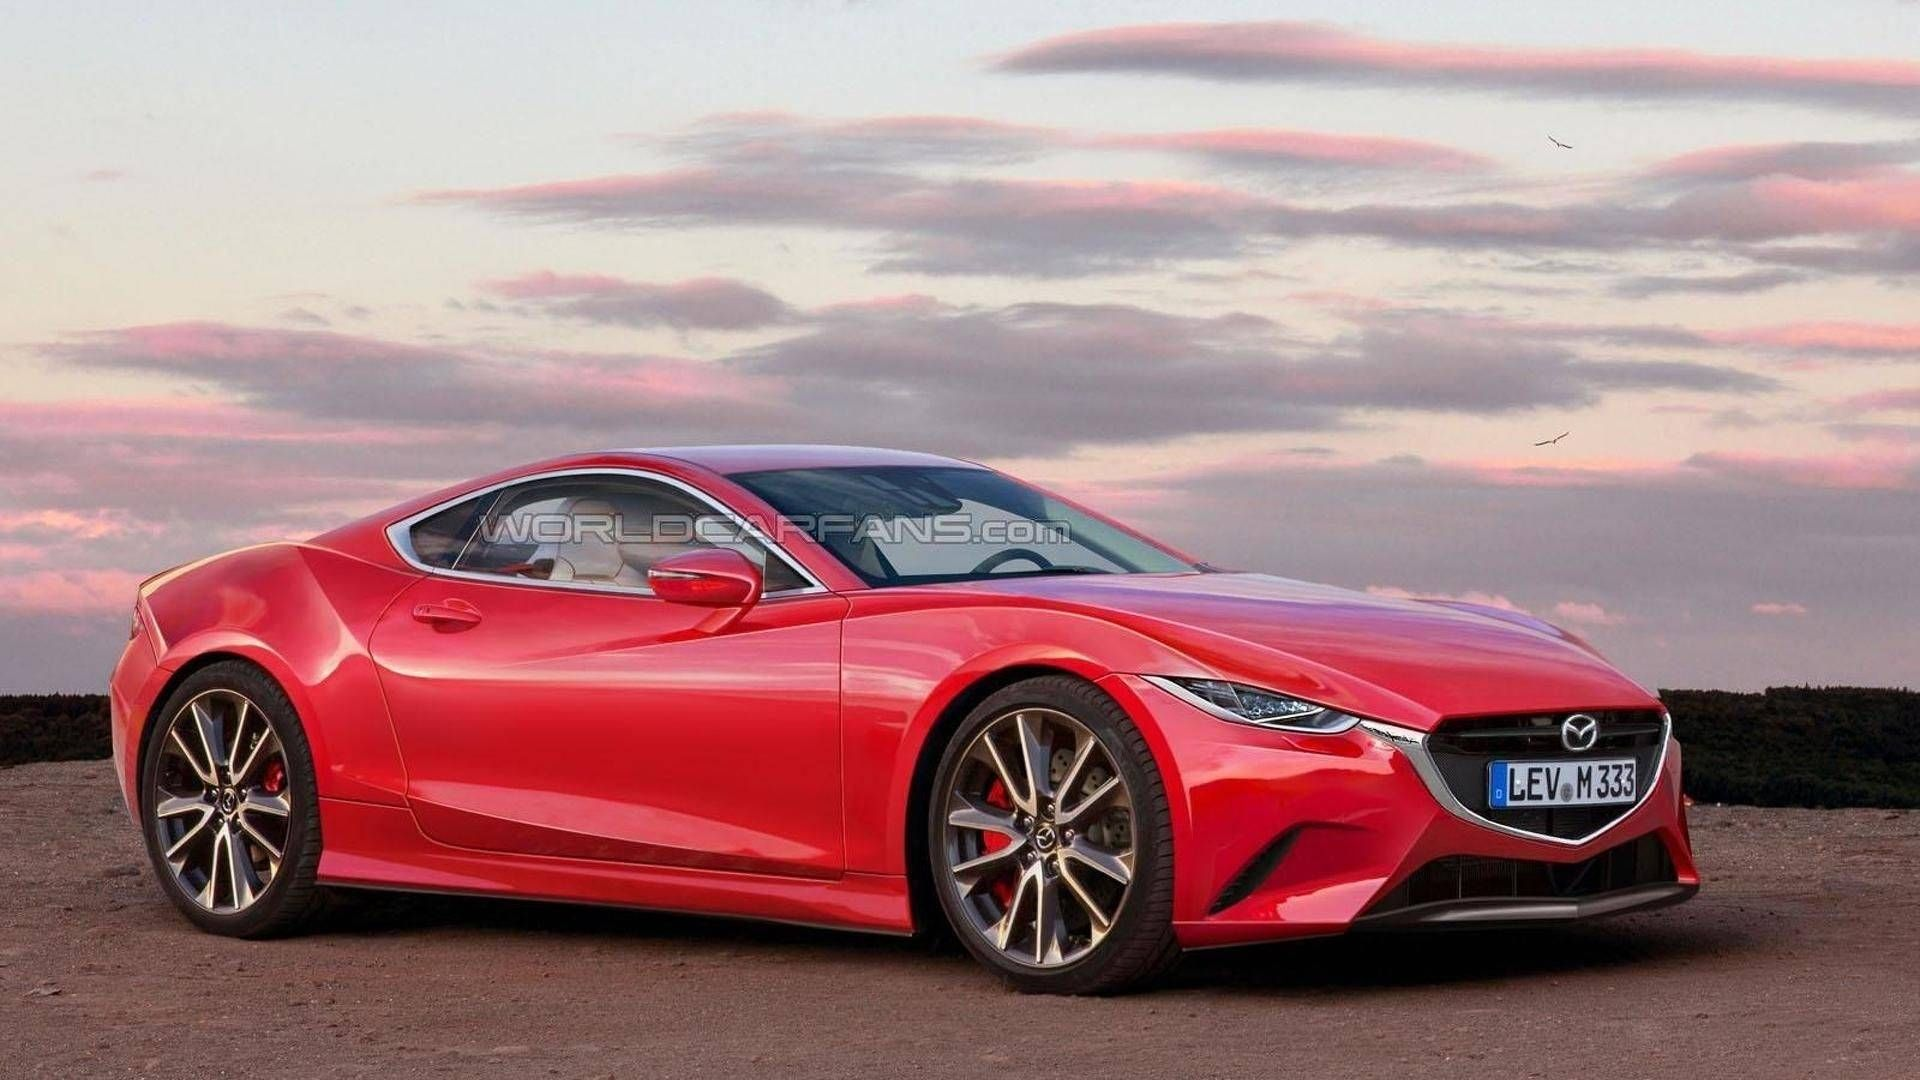 2019 Mazda Rx7 Interior Cars Picture Pinterest Mazda Cars And